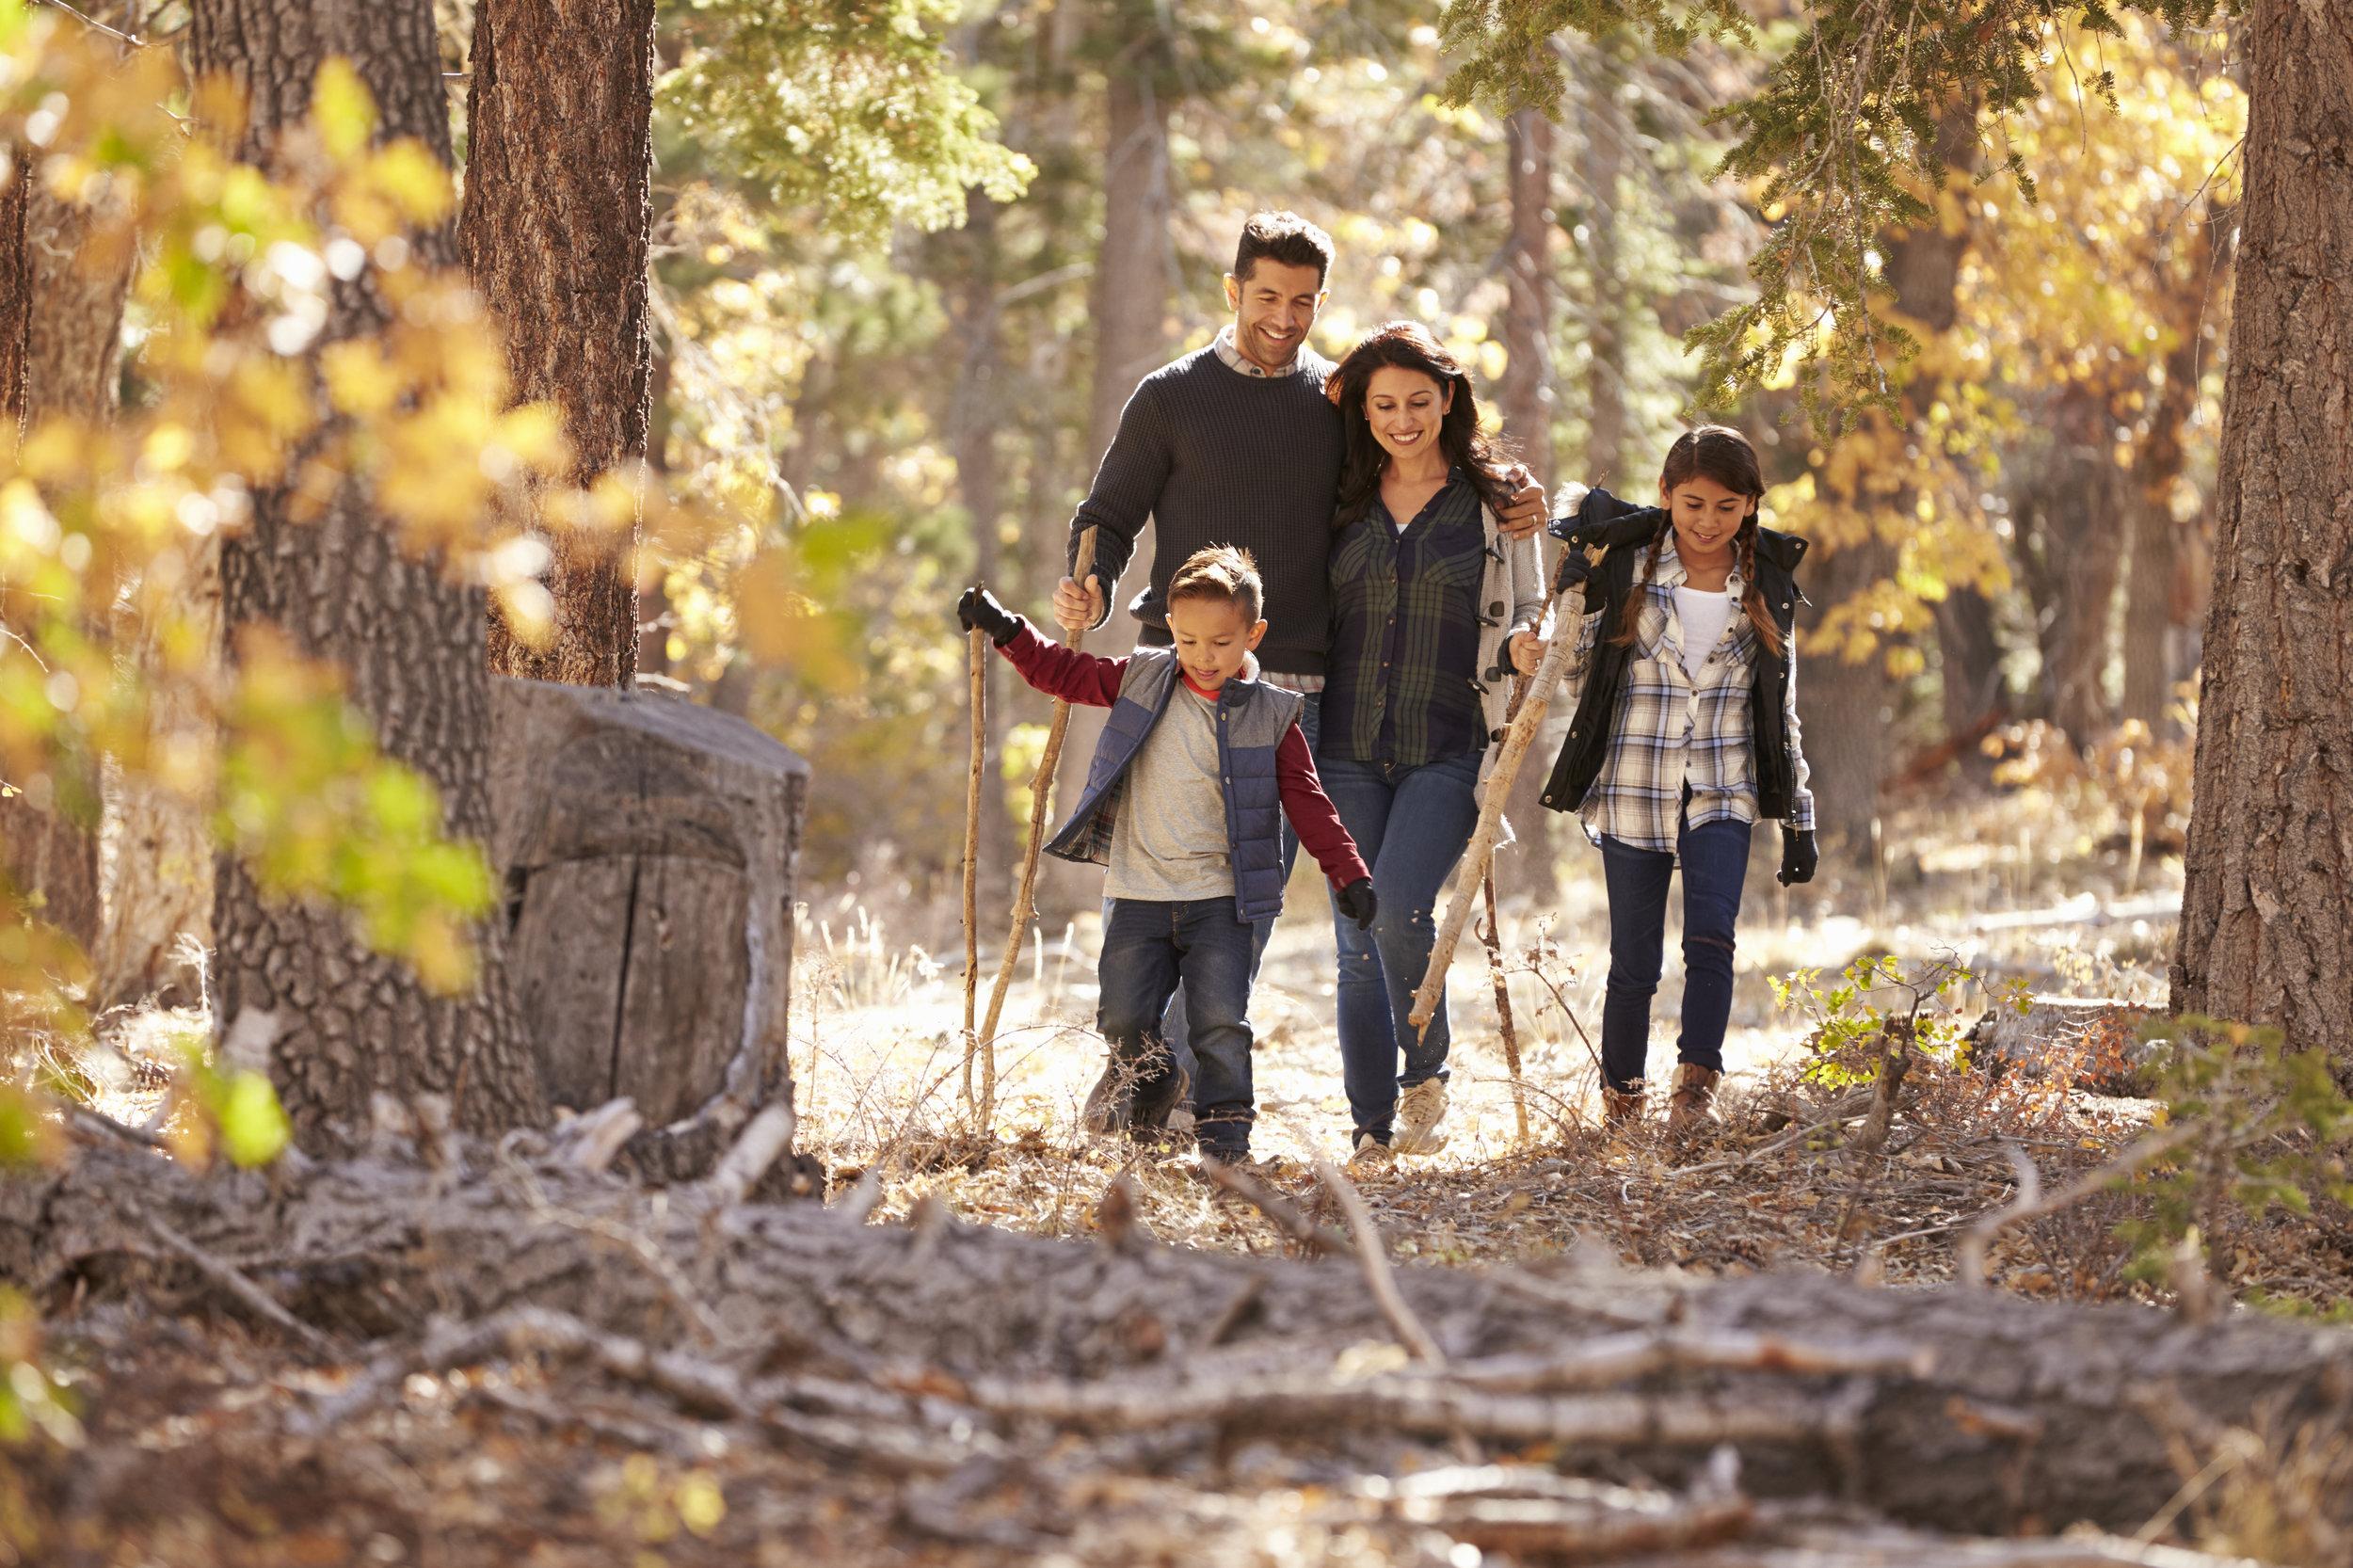 Family hiking in woods on Aberdeen walking trail